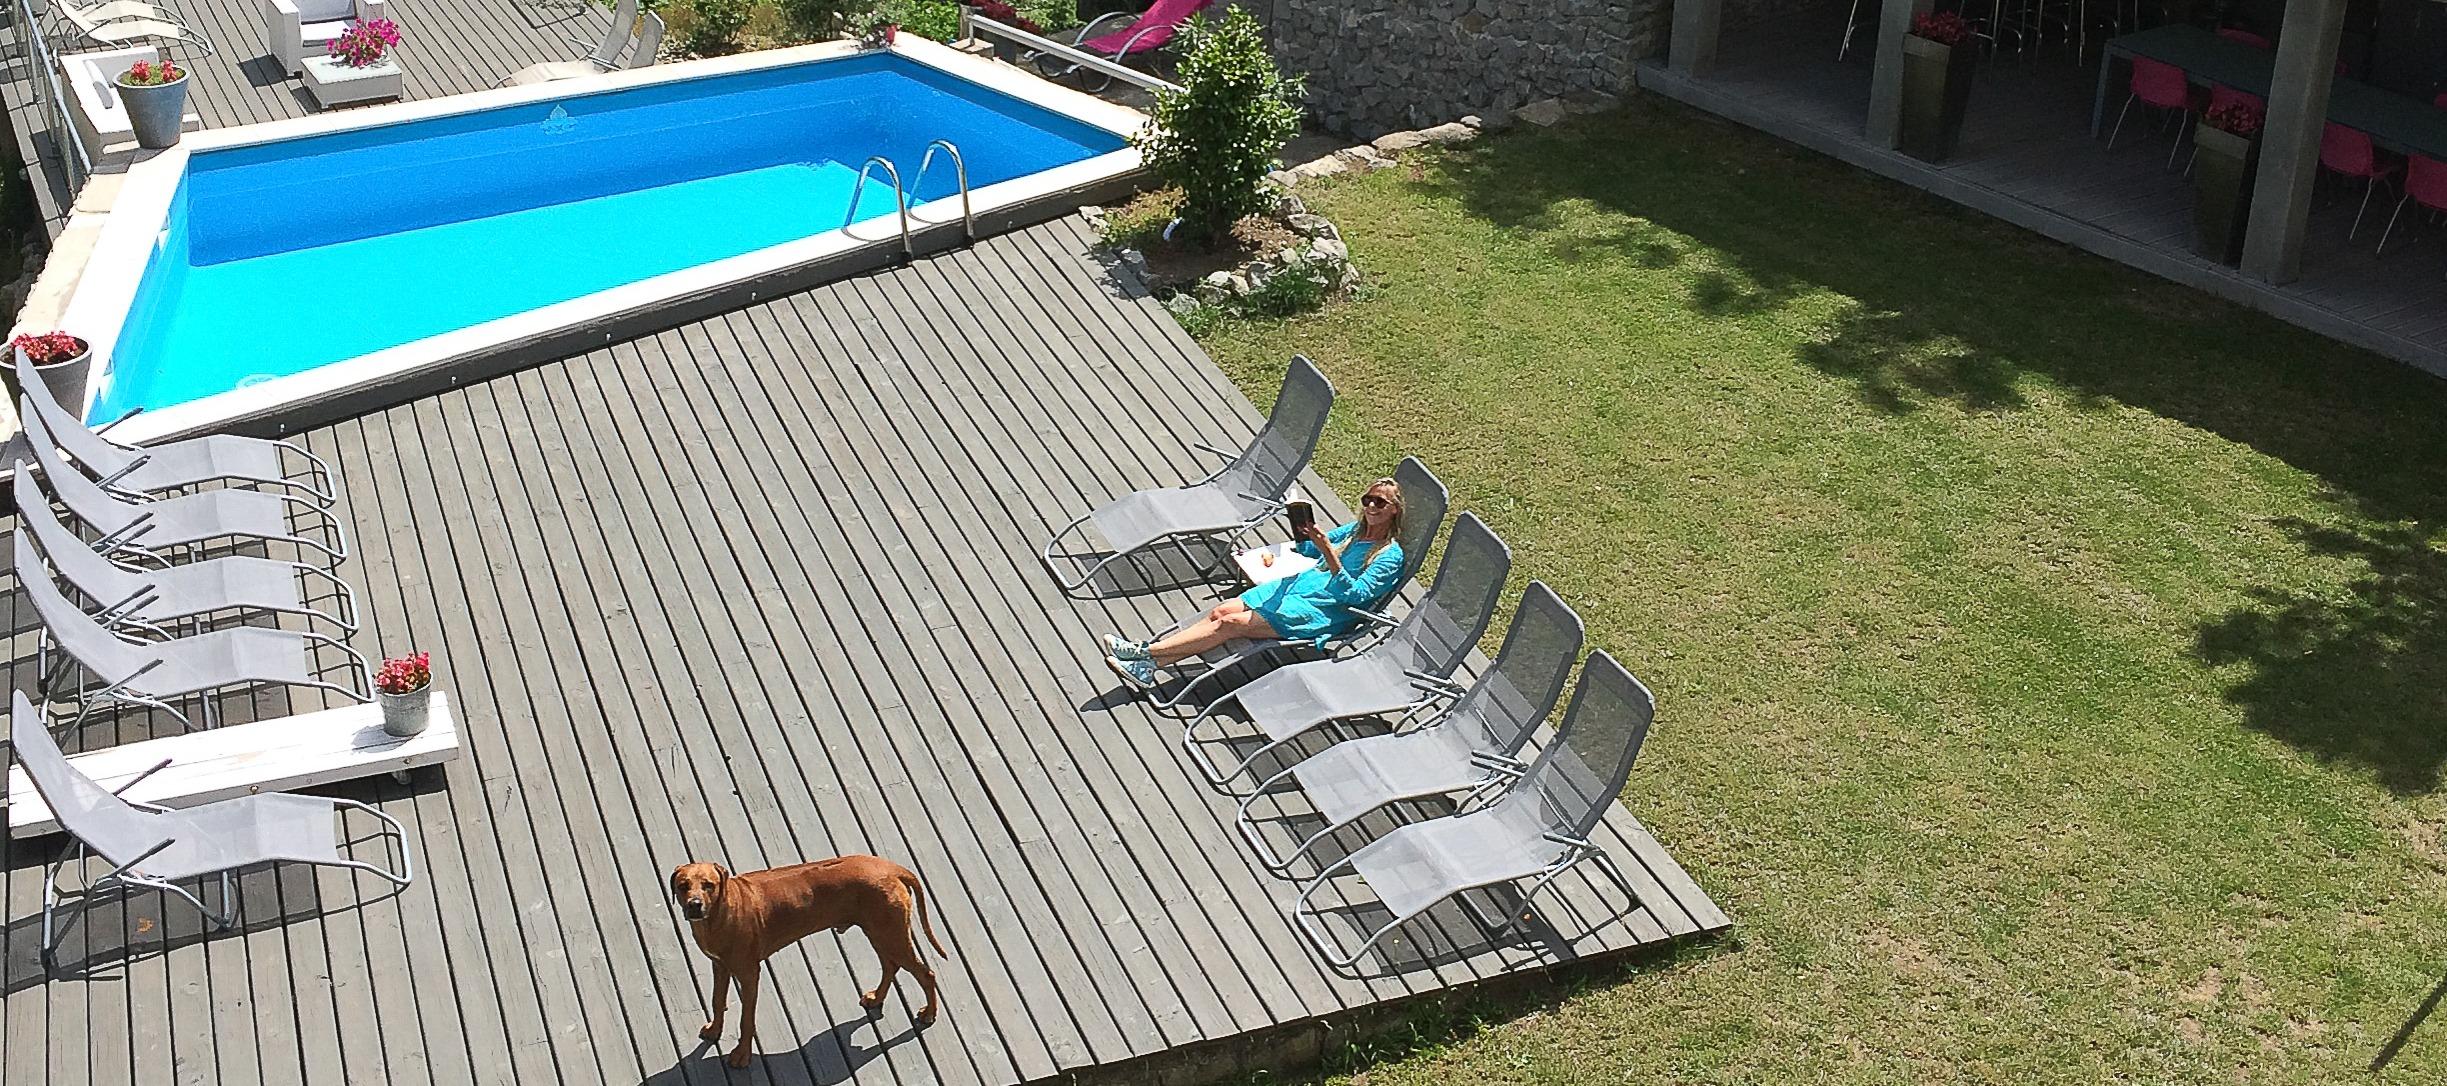 Tuin zwembad/ Jardin piscine